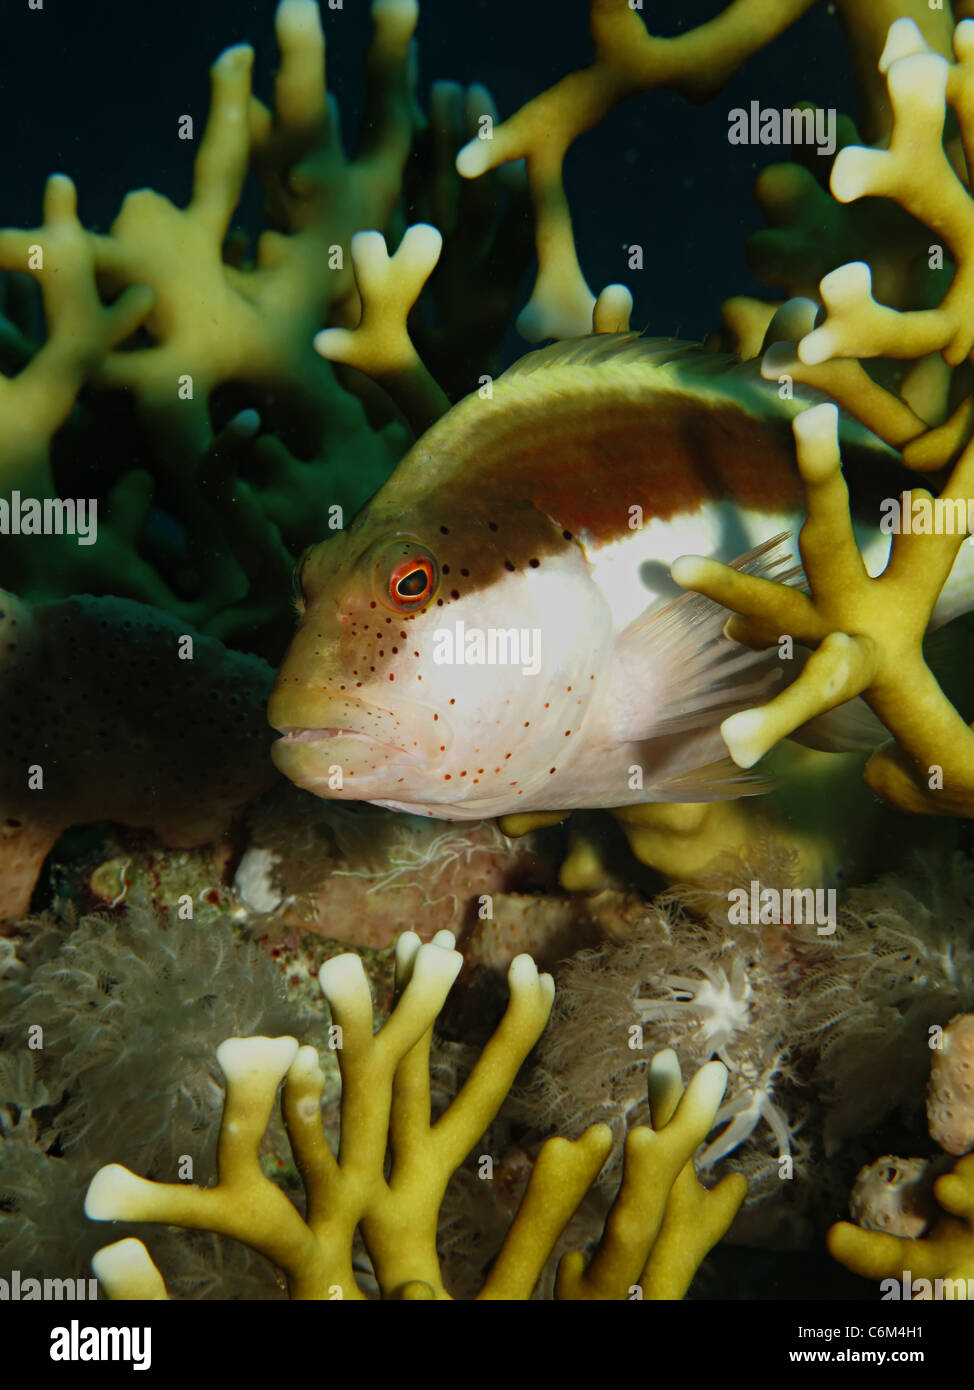 Freckled hawkfish (Paracirrhites forsteri) - Stock Image